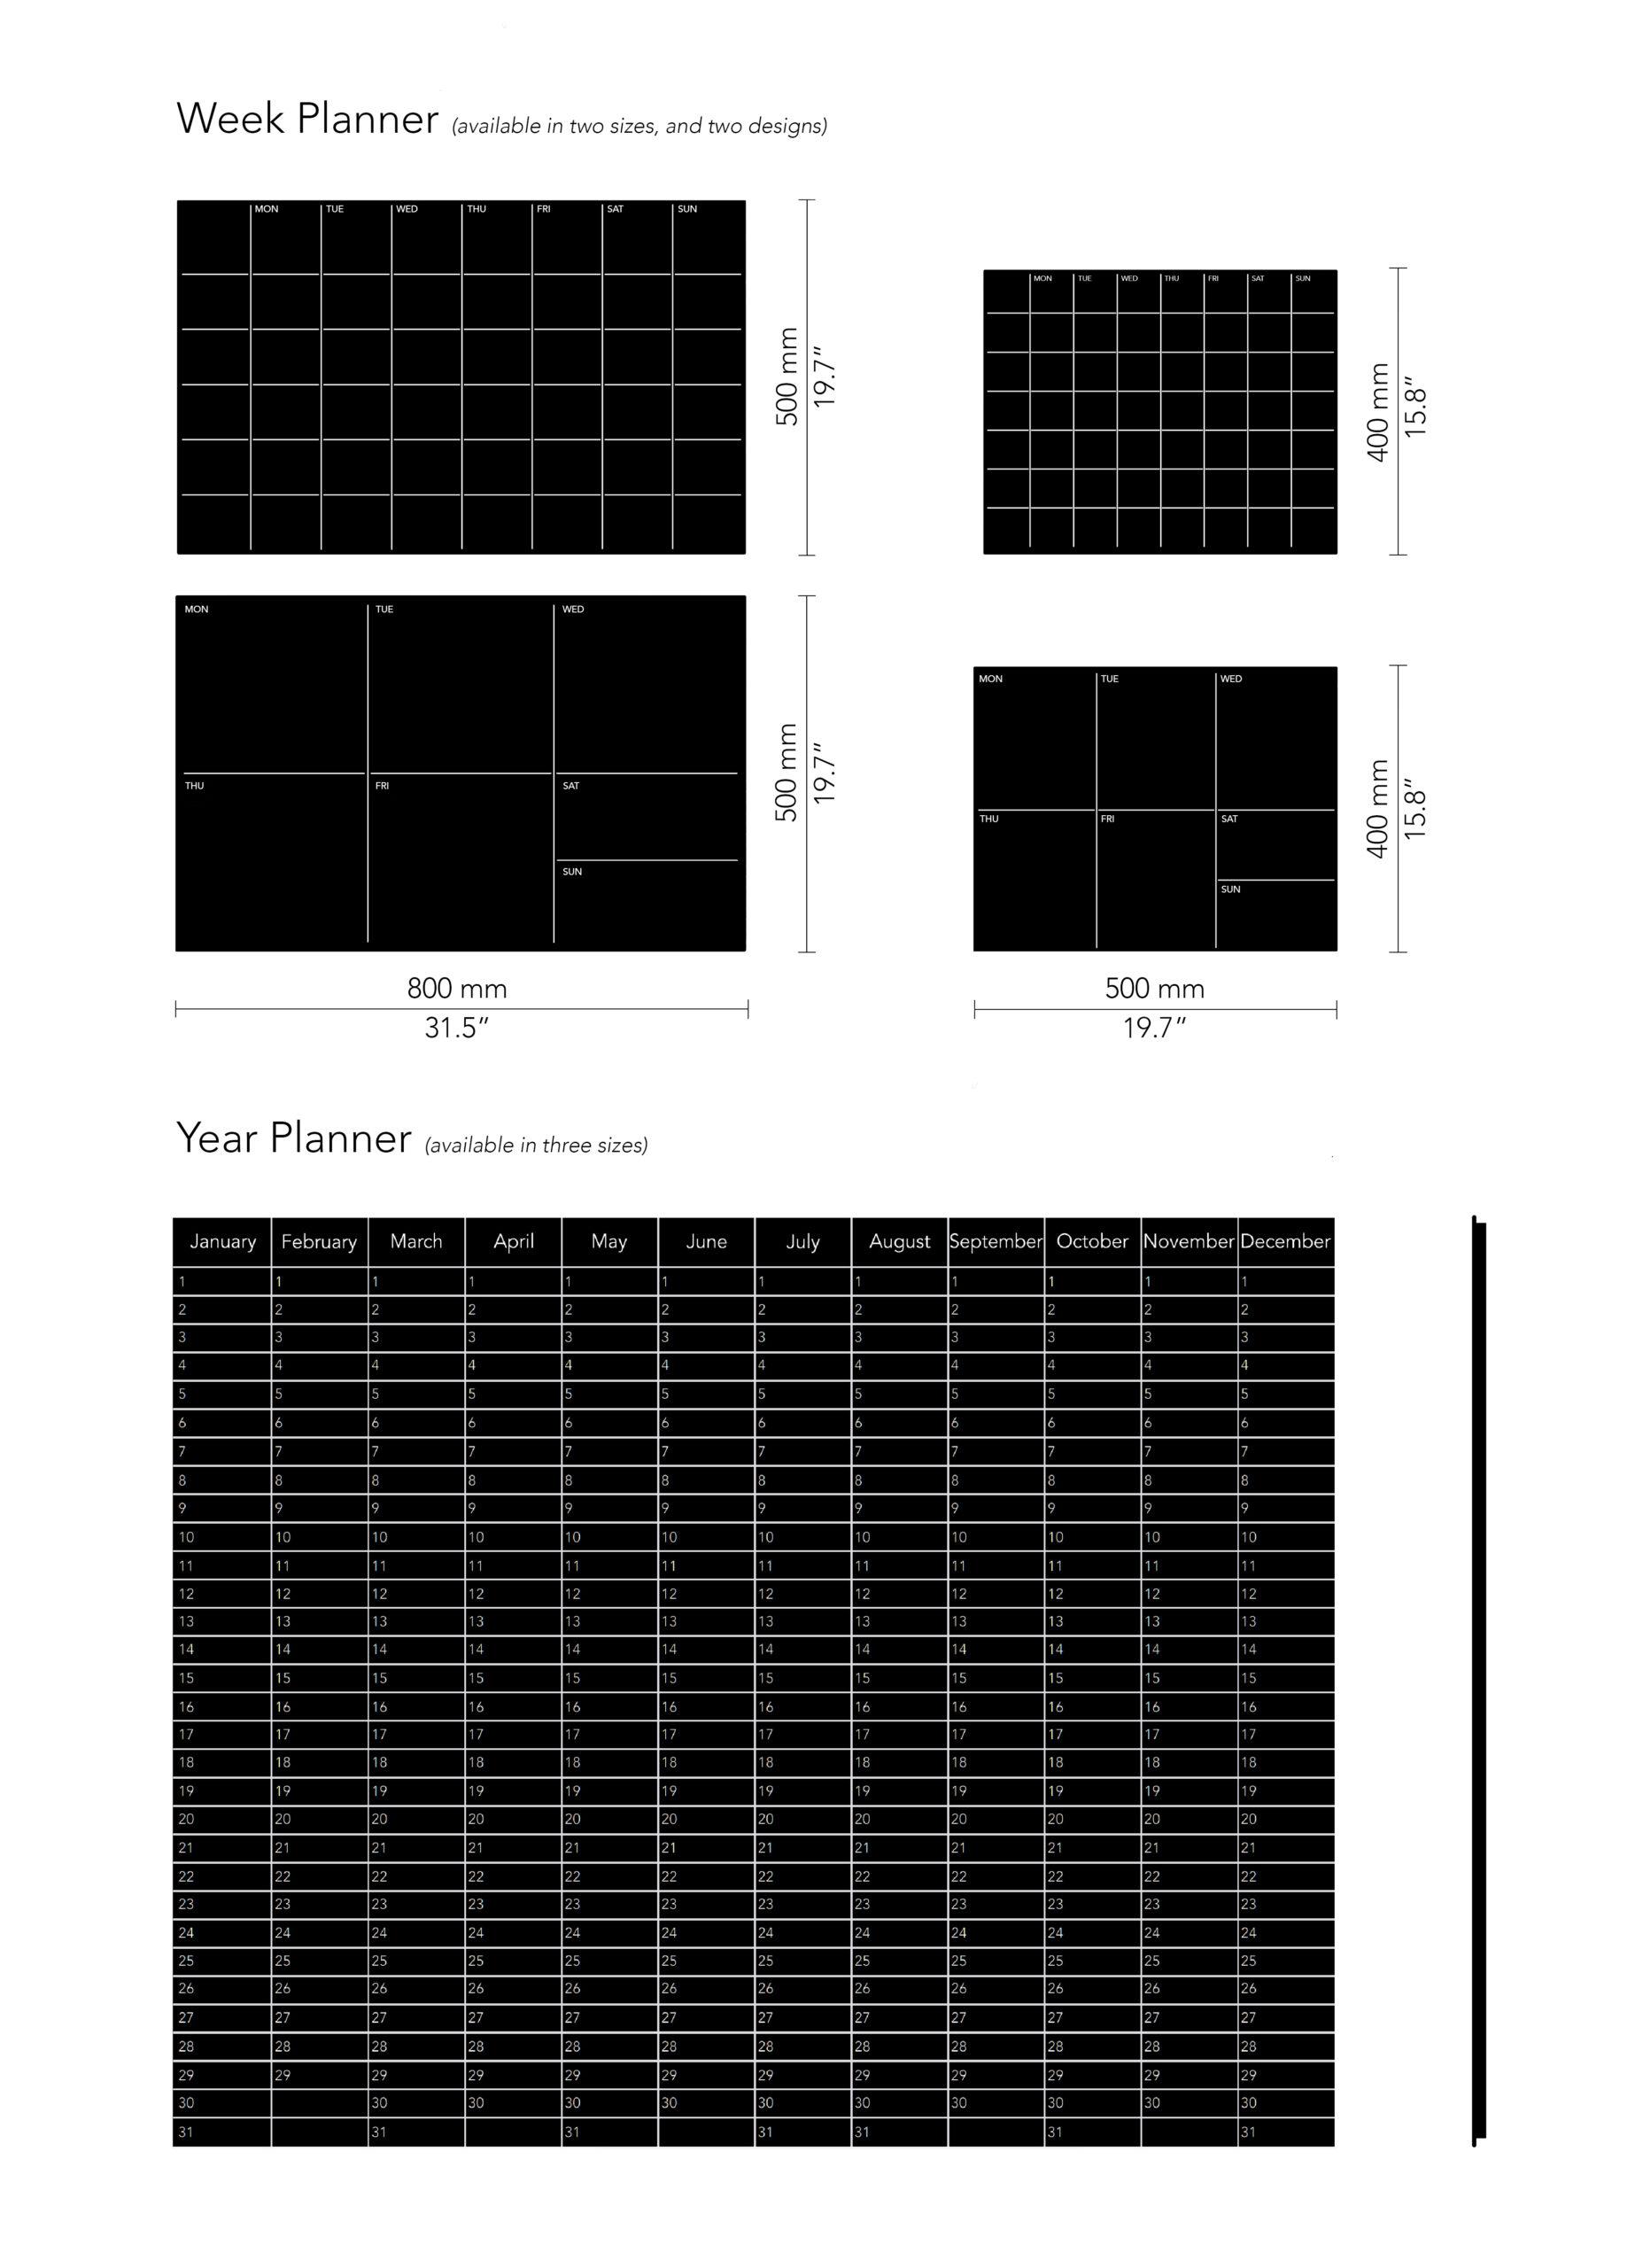 CHAT BOARD Planner drawings, black